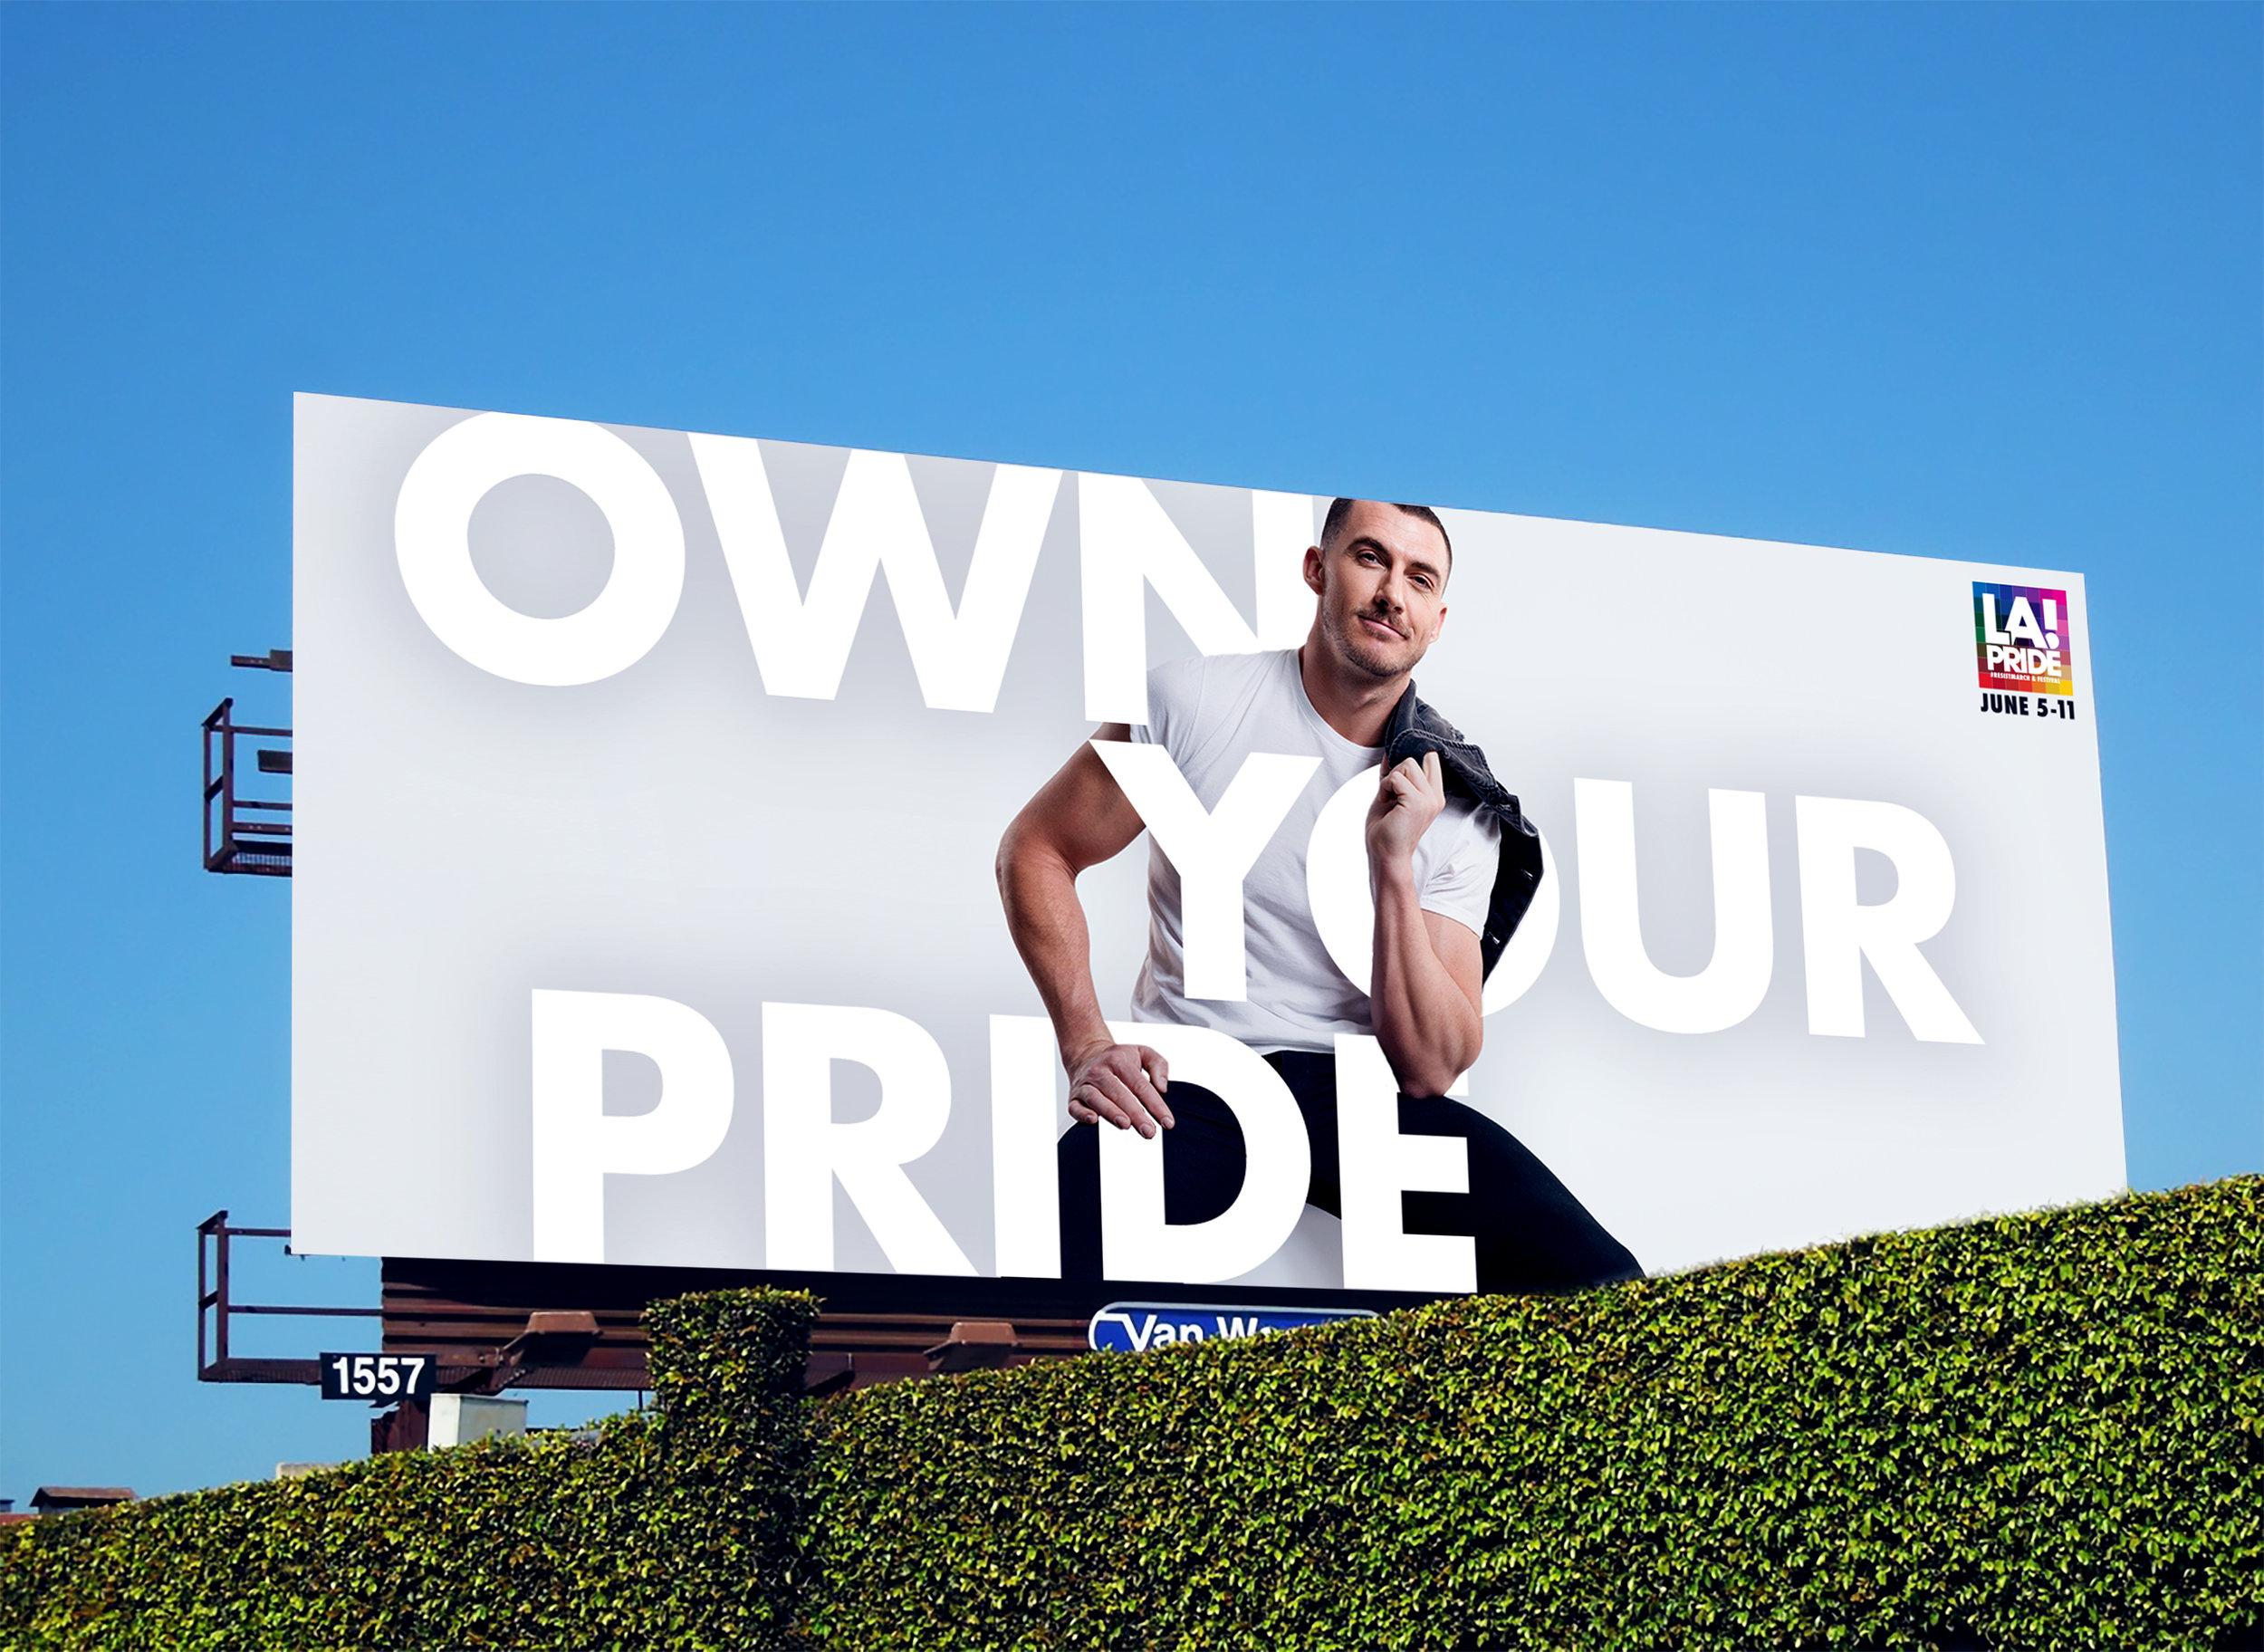 LAPride_Billboard_1.jpg